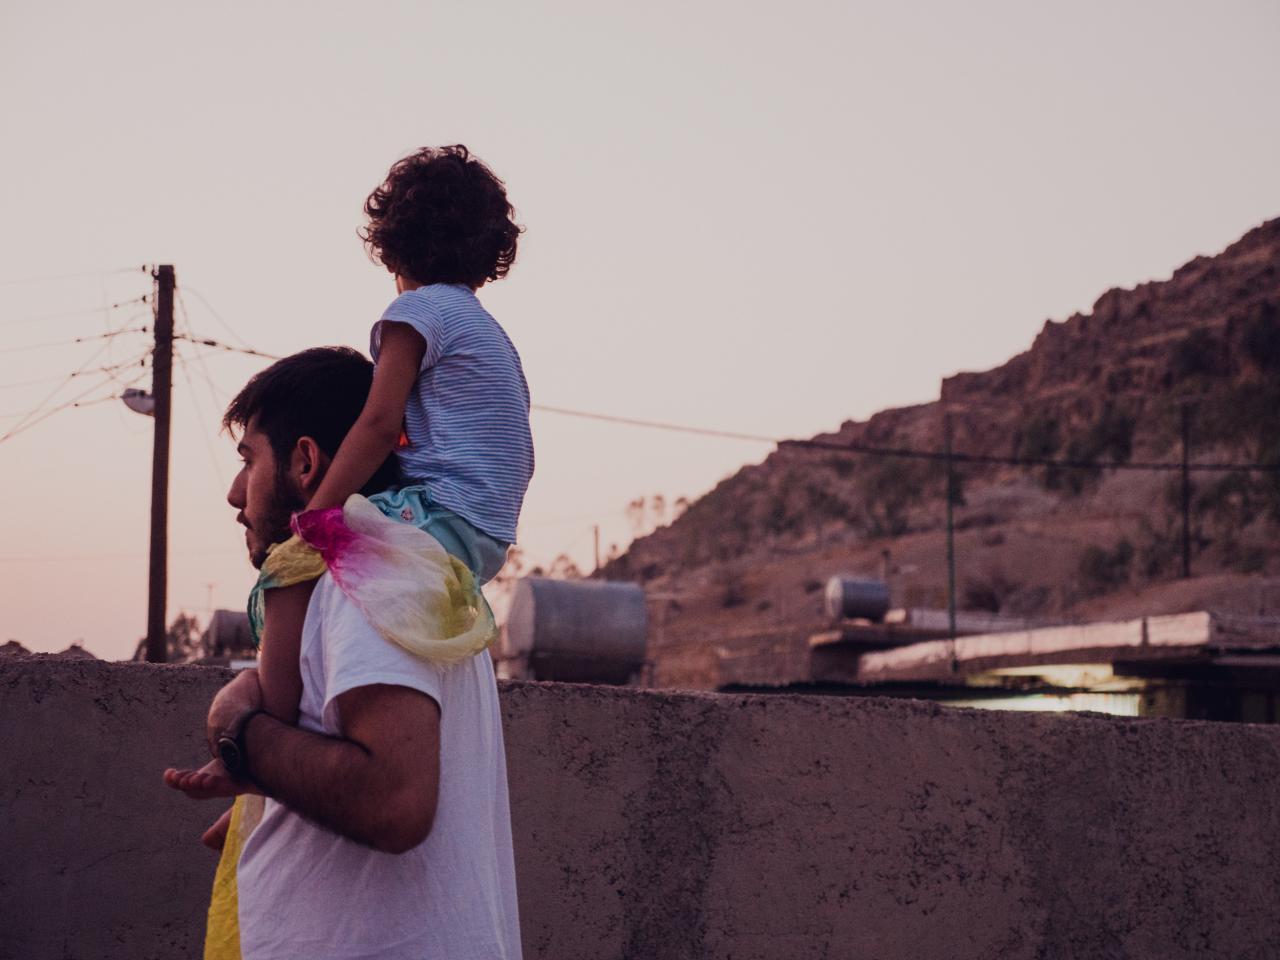 Saman-Shariati-Hometown-5.jpg